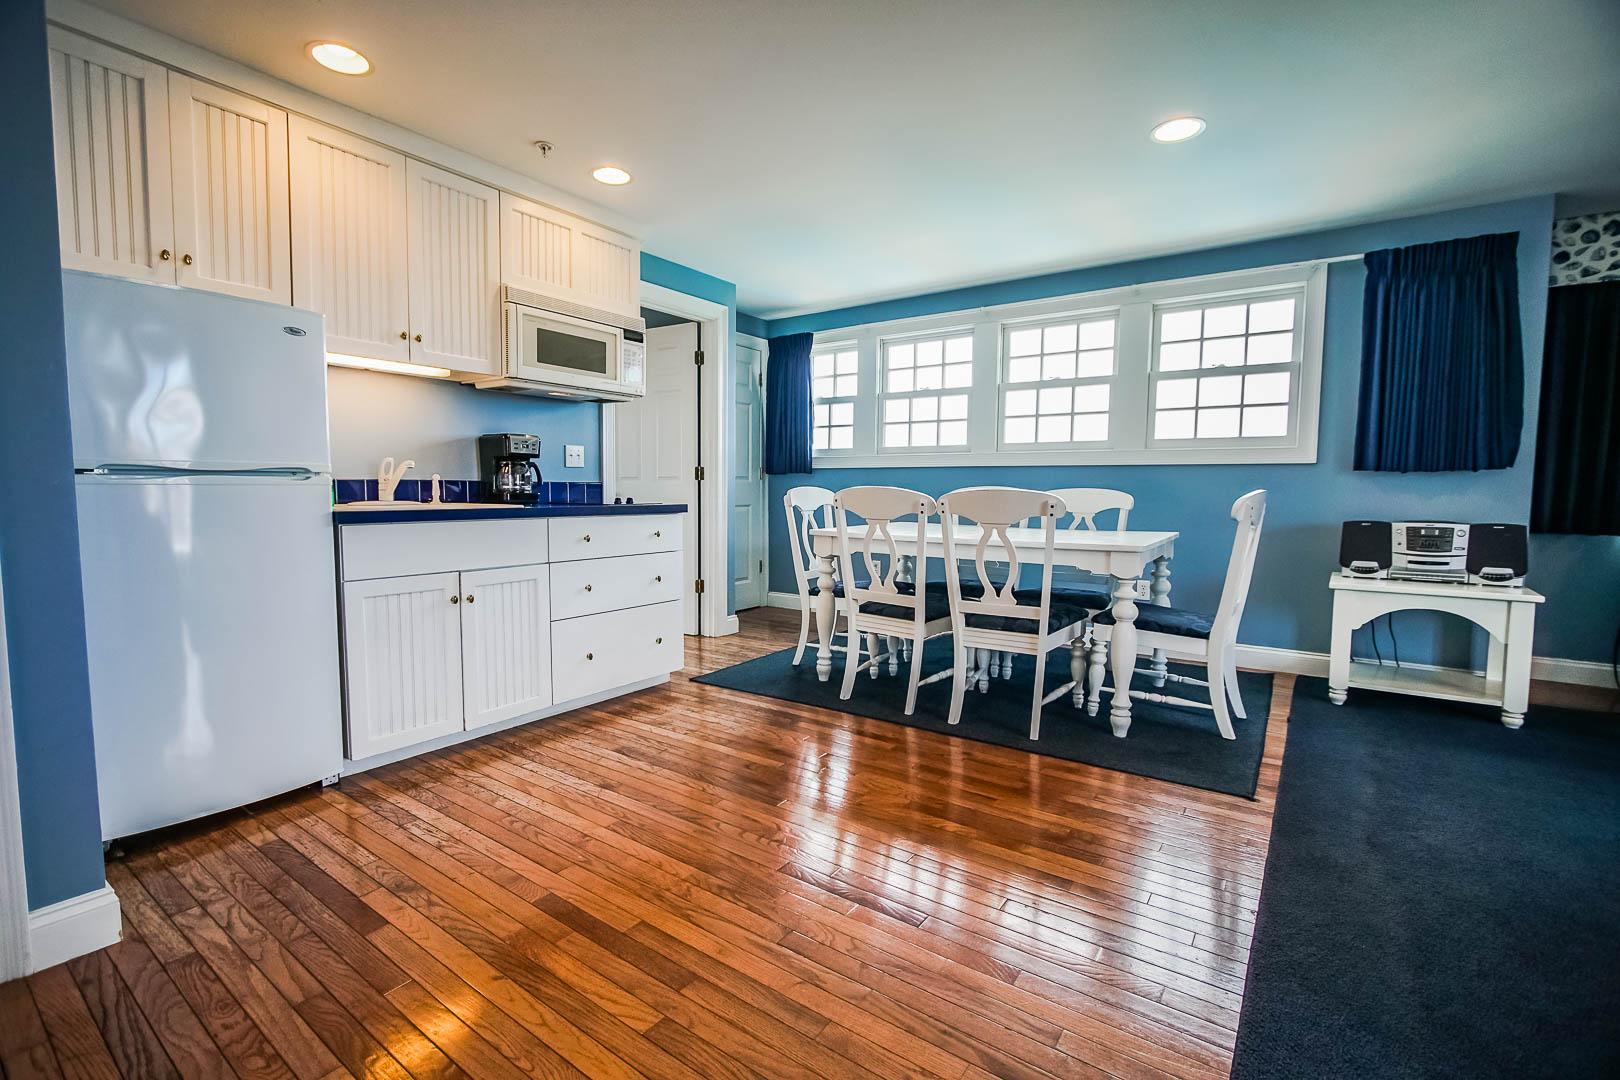 A spacious full kitchen at VRI's Beachside Village Resort in Massachusetts.